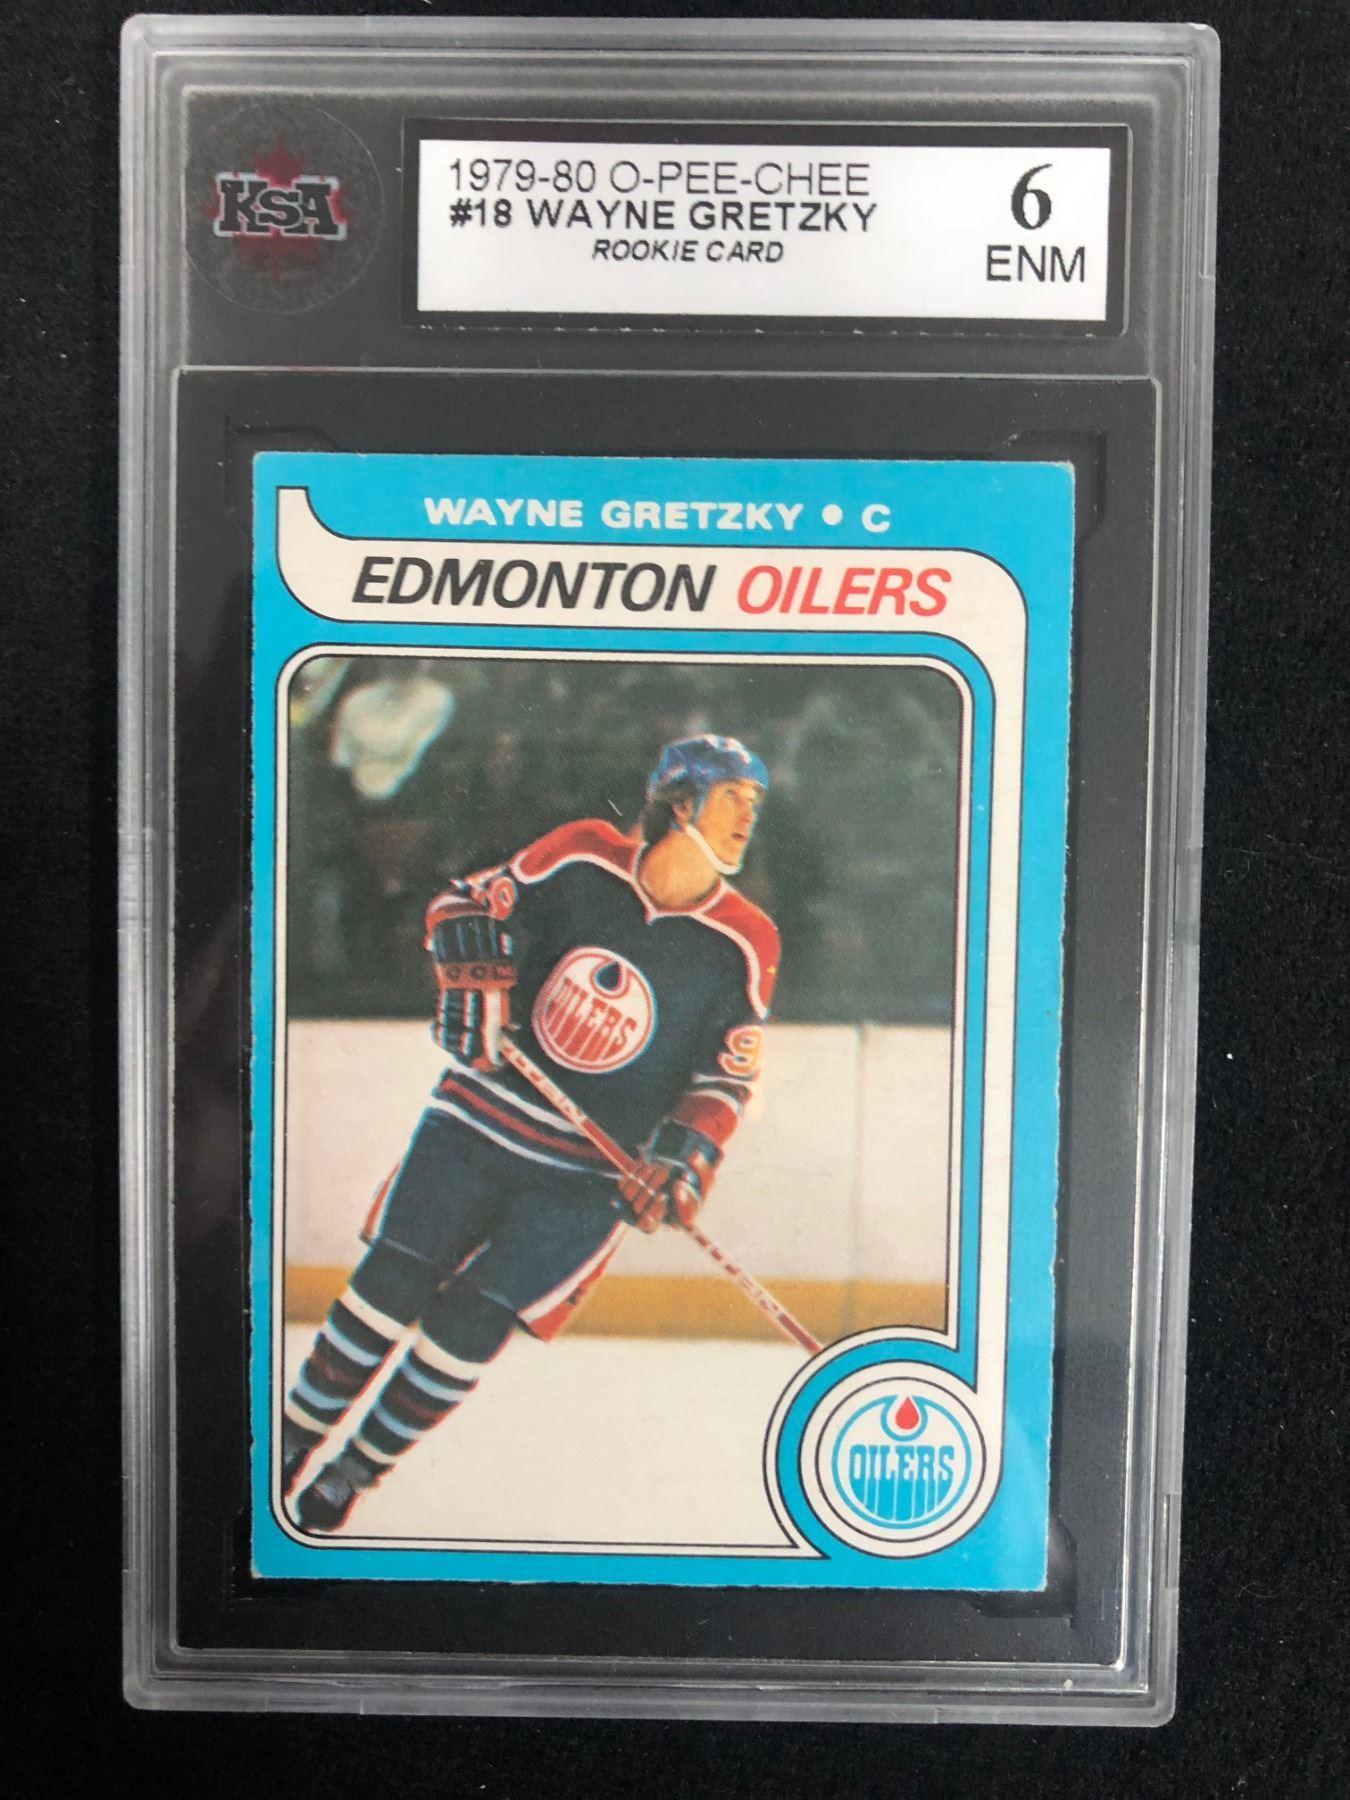 1979 80 O Pee Chee 18 Wayne Gretzky Rookie Card 6 Enm